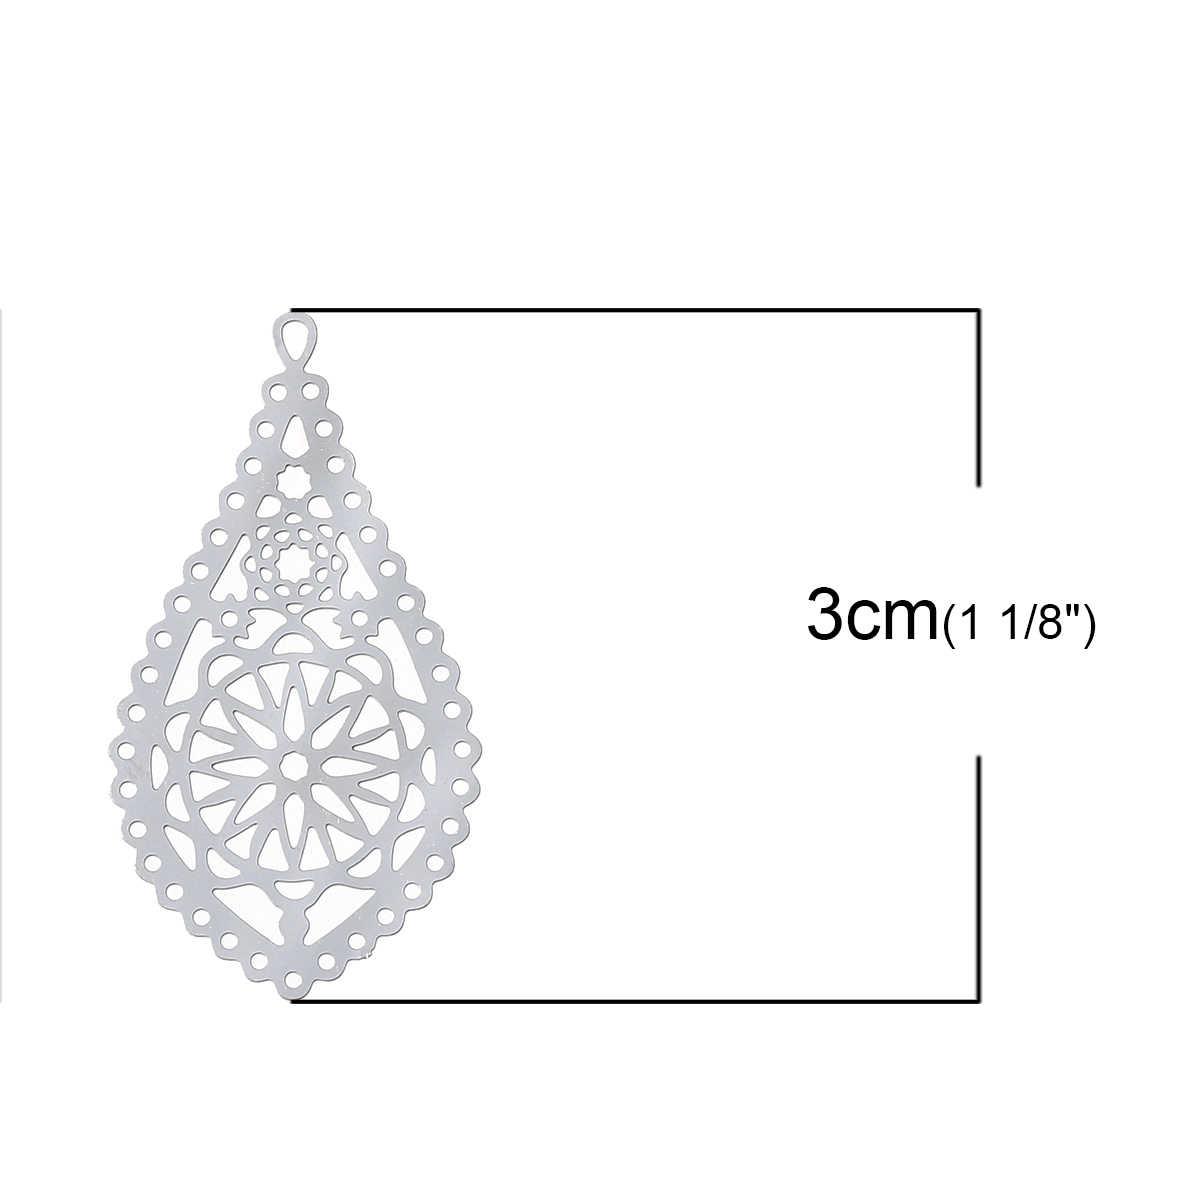 "DoreenBeads פיליגרן נירוסטה קסם תליוני Teardrop כסף טון פרח חלול מגולף 30mm (1 1/8 "") x 16mm (5/8 ""), 2 Pcs"